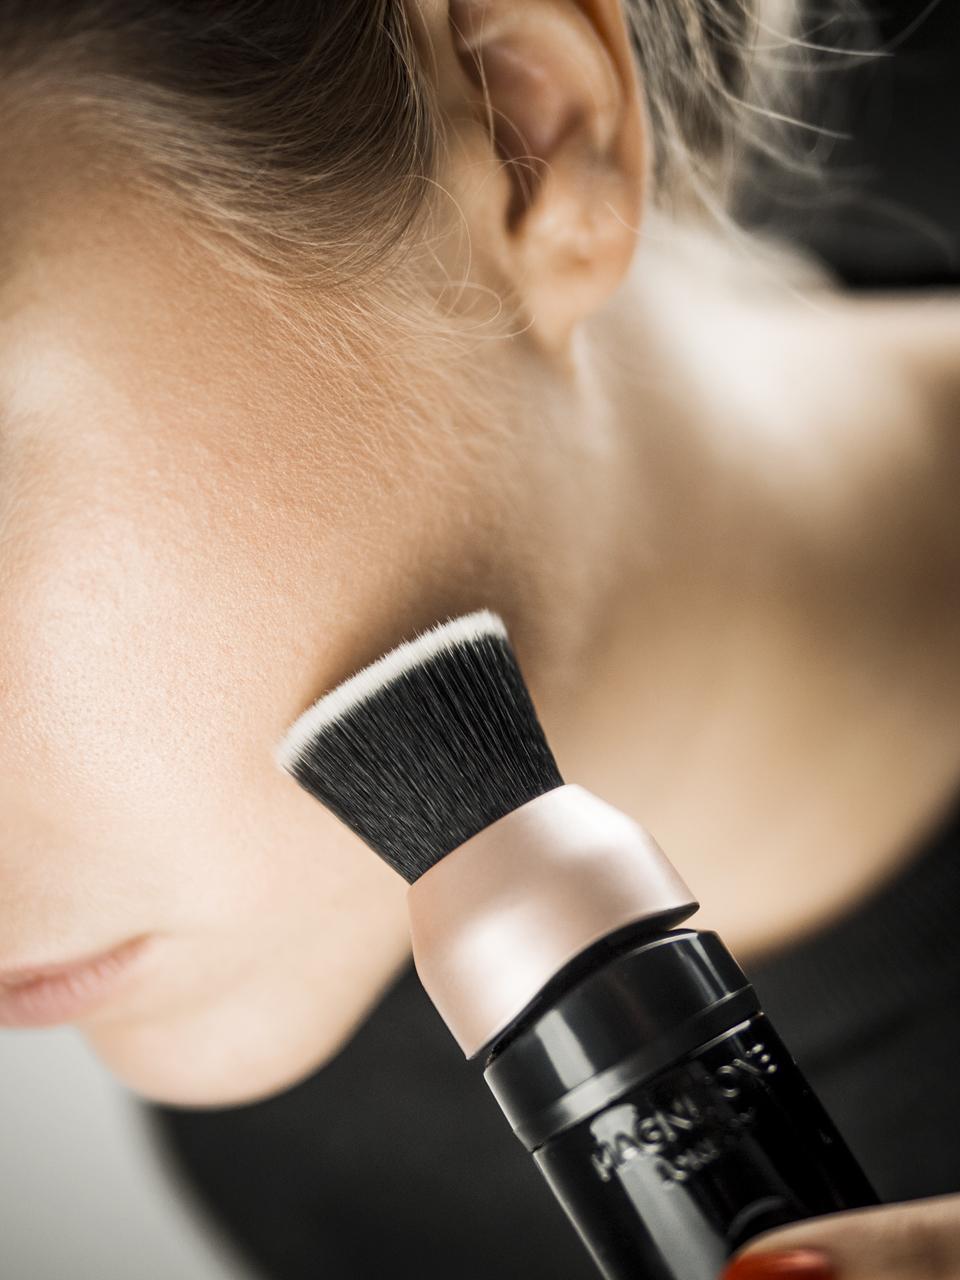 Magnitone BlendUp, BlendUp, Make-up Tool, Beauty Tools, natürlicher Make-up Look, natürliches Make-up, Flawless Make-up, natürliche Grundierung, natürliche Foundation, Make-up Tipps, Make-up, Schminken, natürlich schminken, natürlich schön